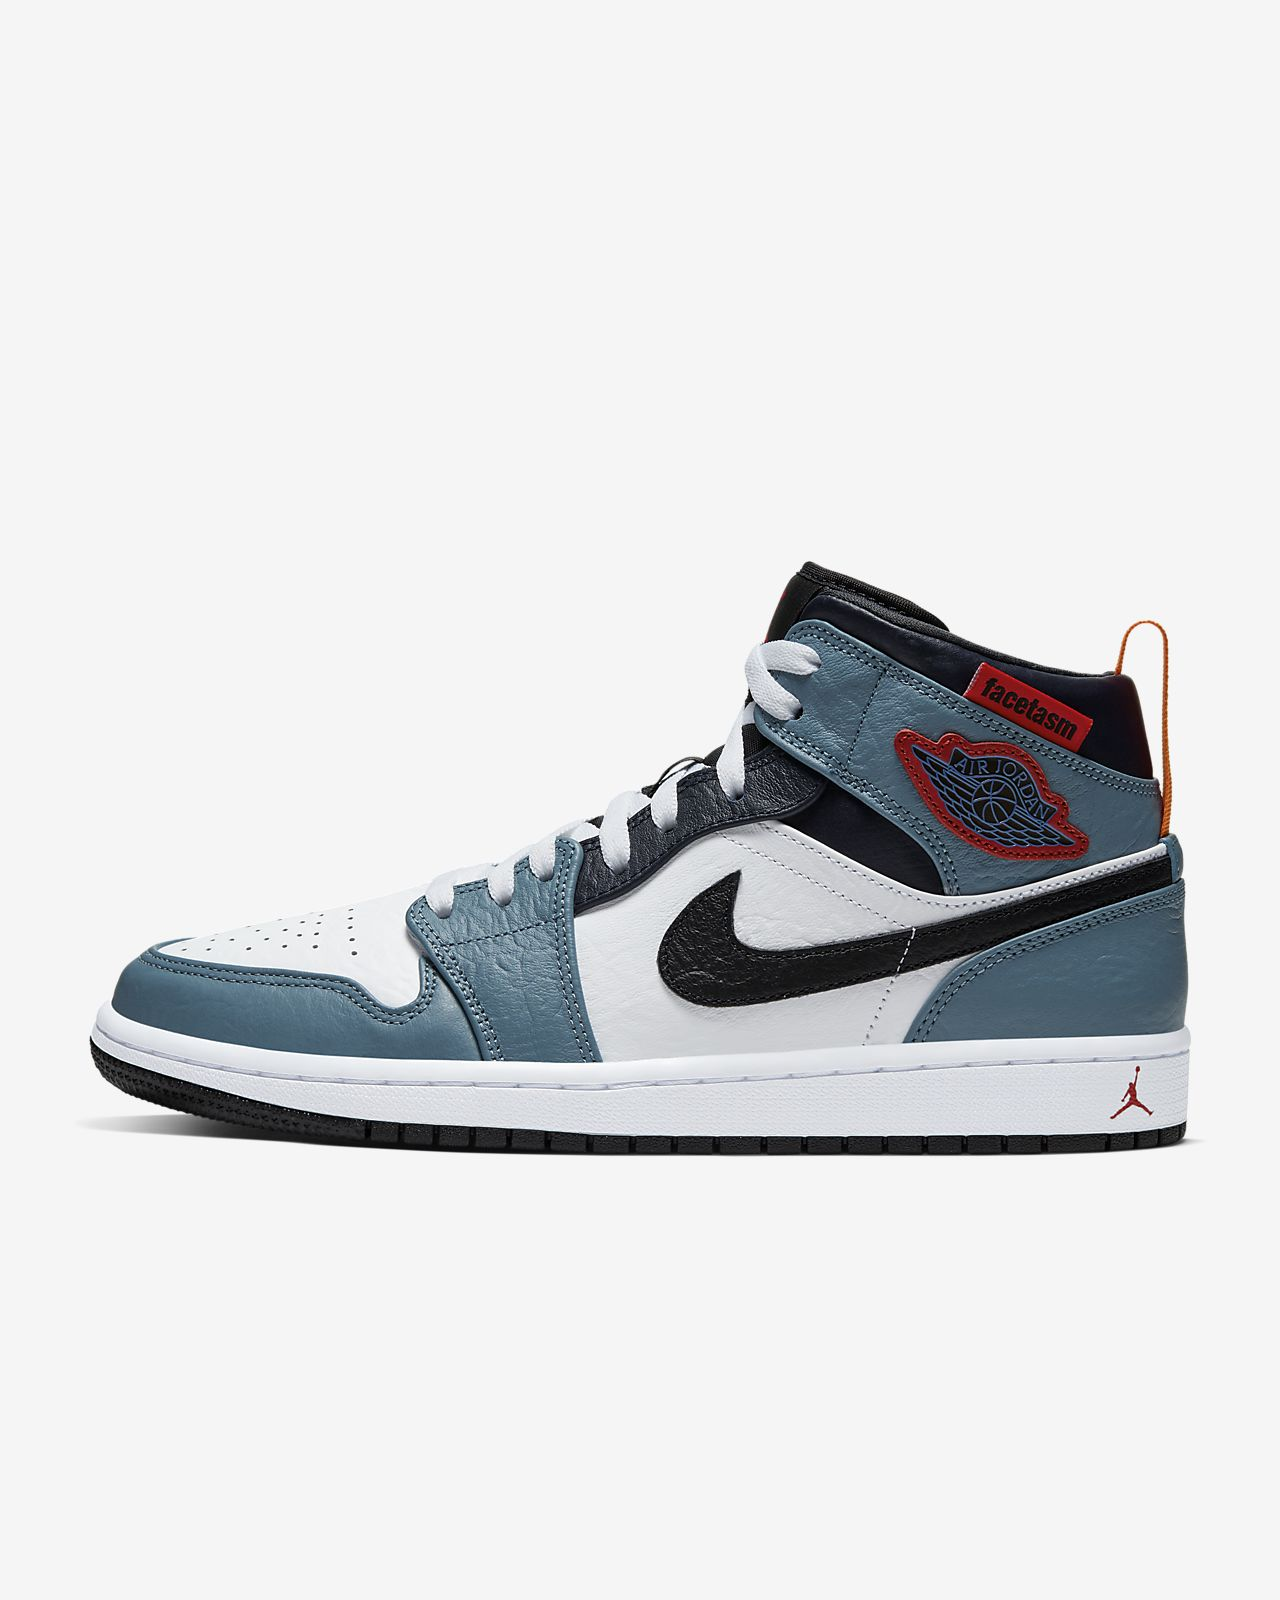 Air Jordan 1 中筒 SE Fearless 鞋款